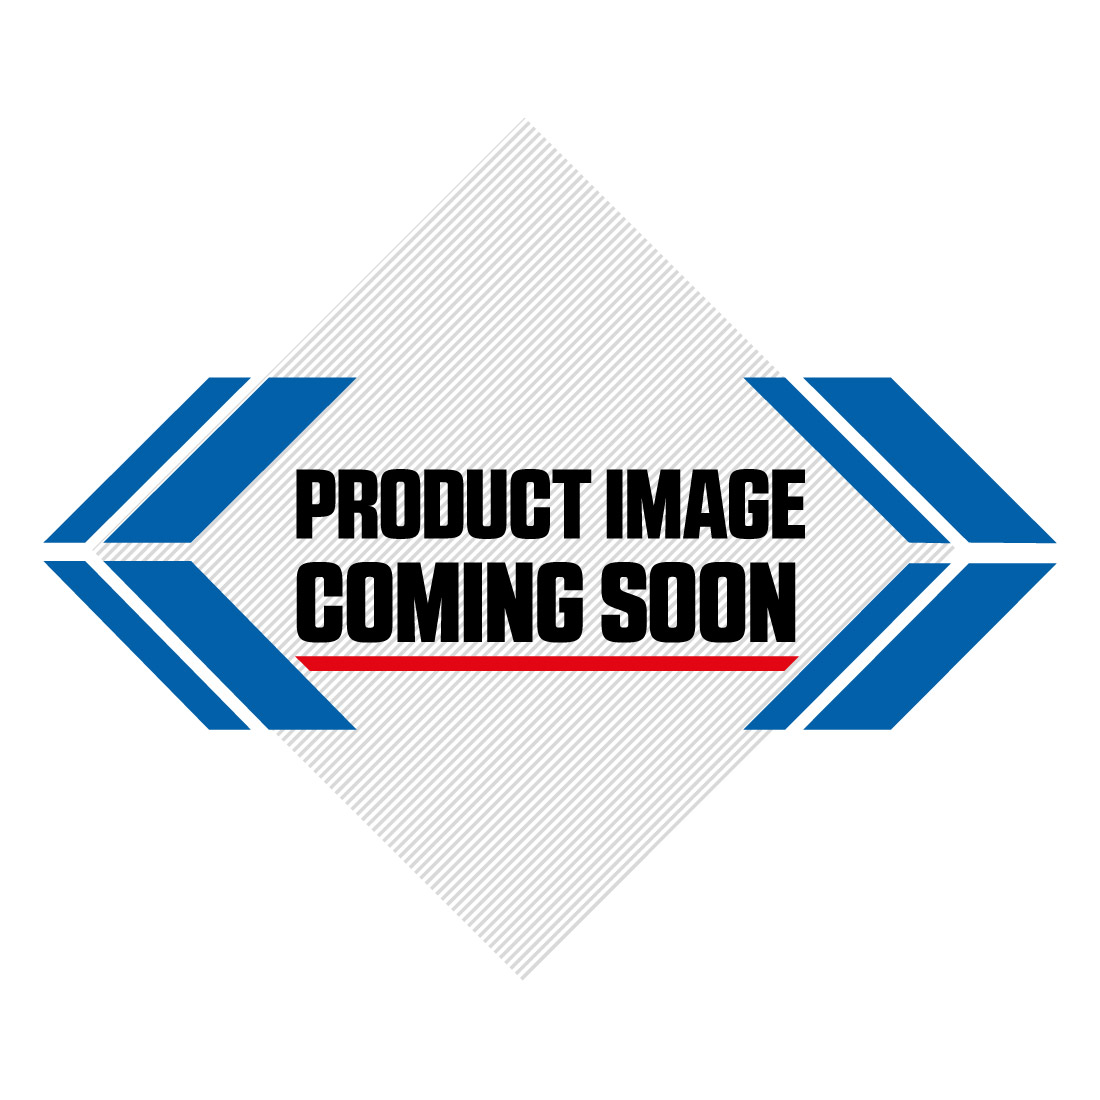 UFO Honda Radiator louvers CRF 250R (18-19) CRF 250RX (2019) OEM Factory Image-0